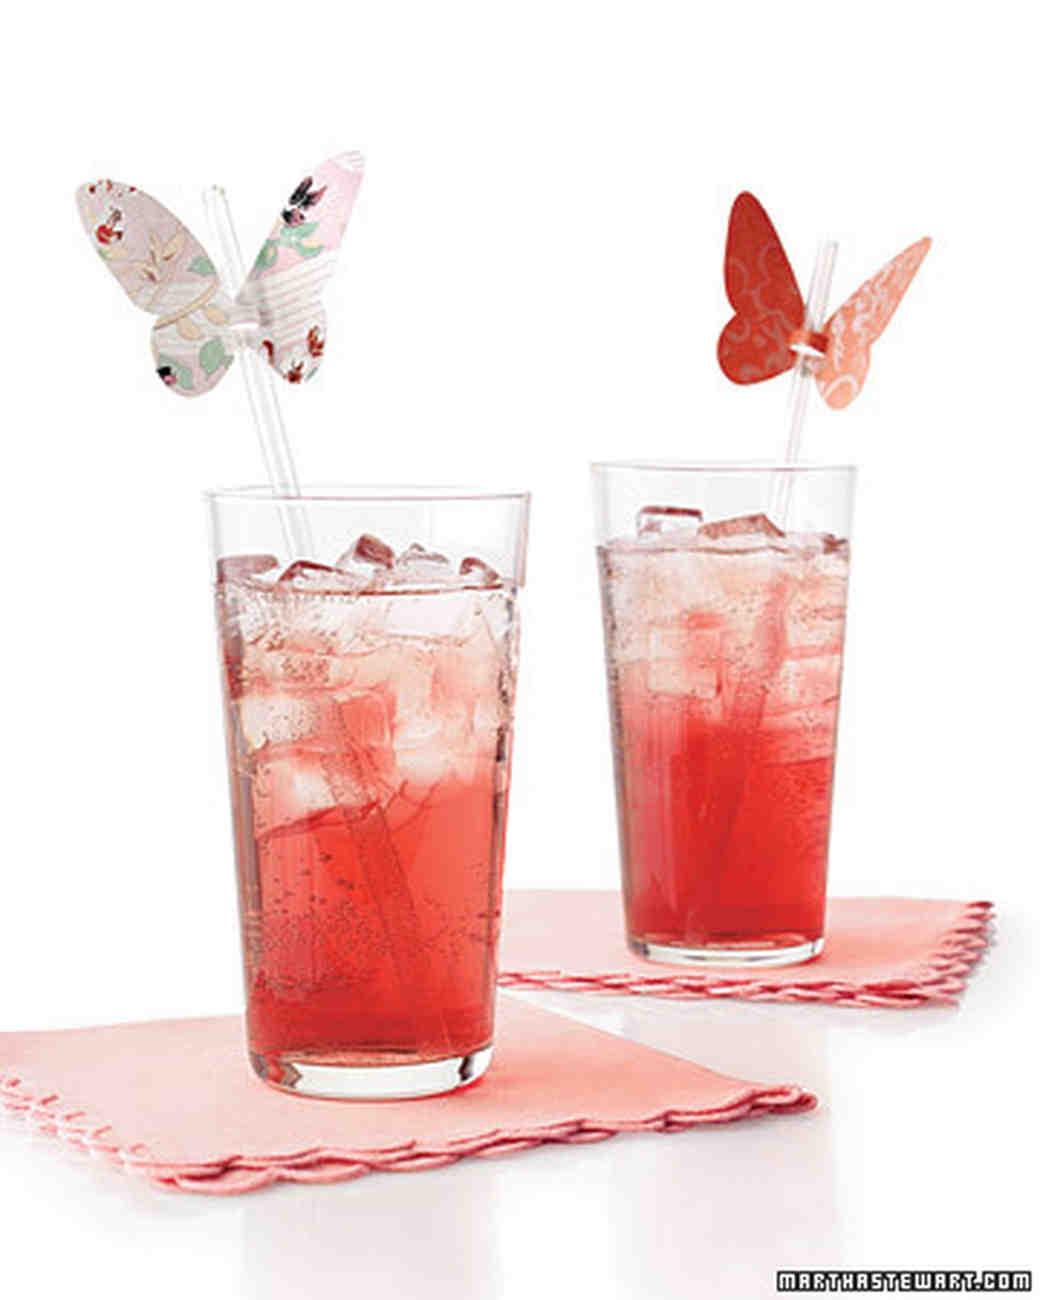 mld1030010_0607_drinks.jpg